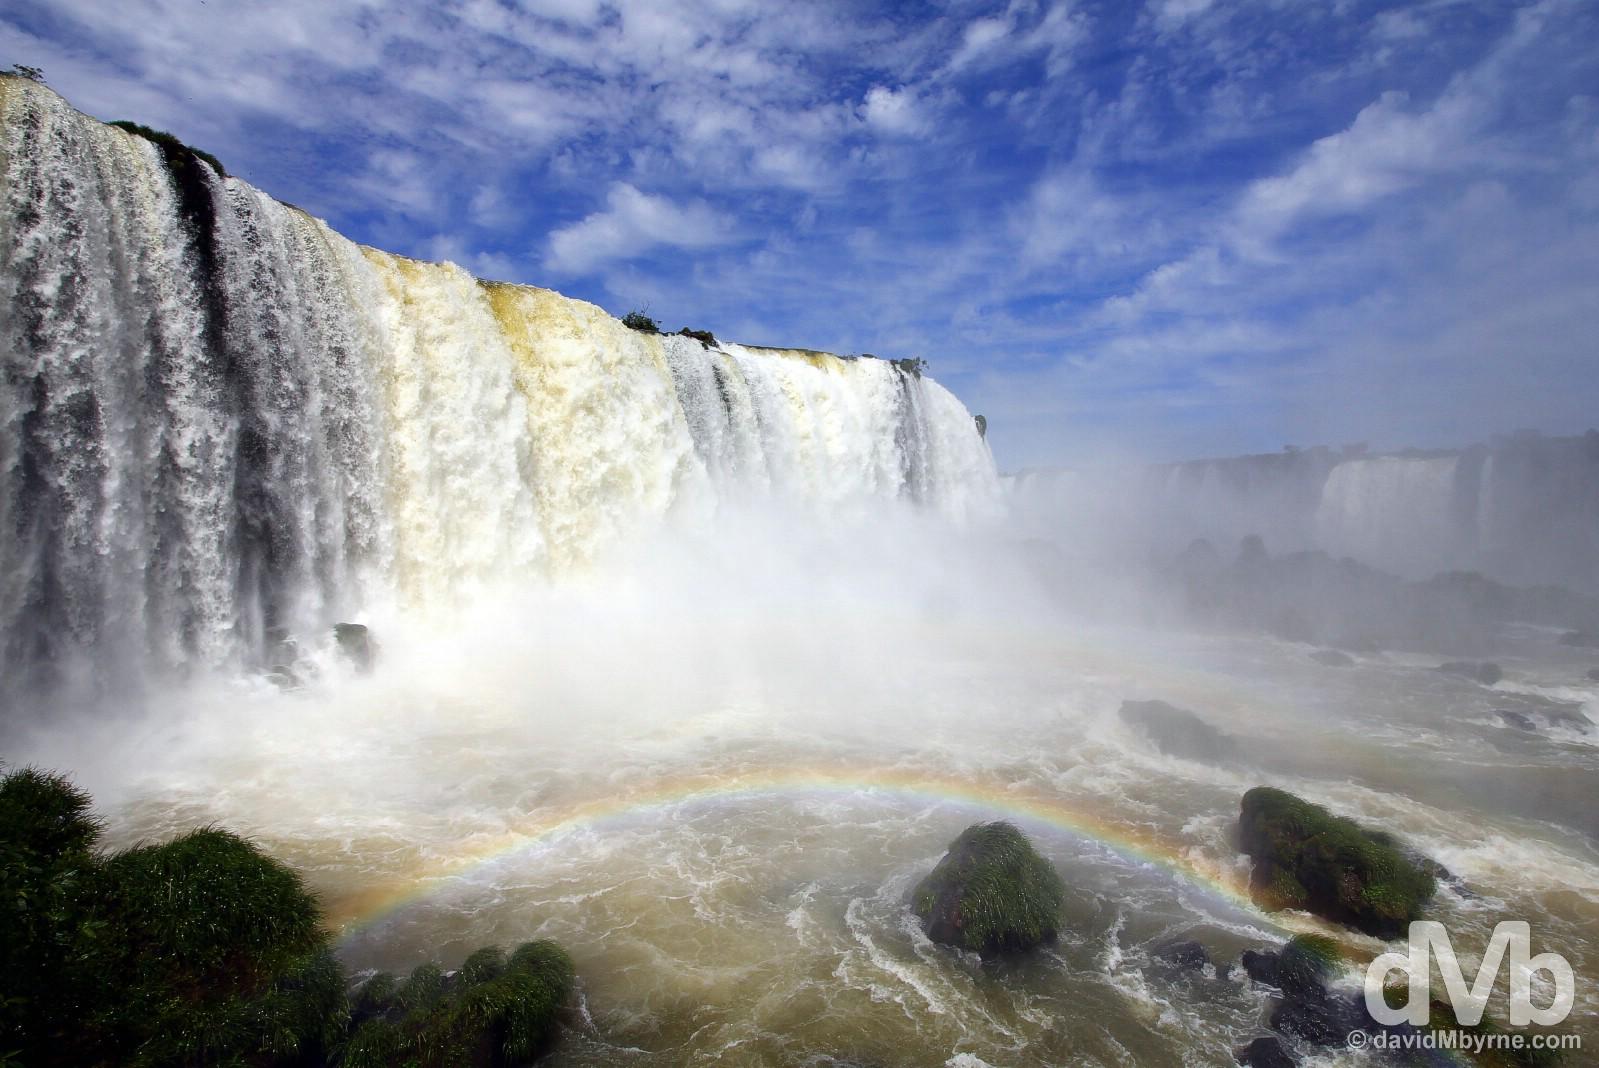 Rainbow at Iguazu Falls in Parque Nacional Do Iguacu, Brazil. September 12, 2015.